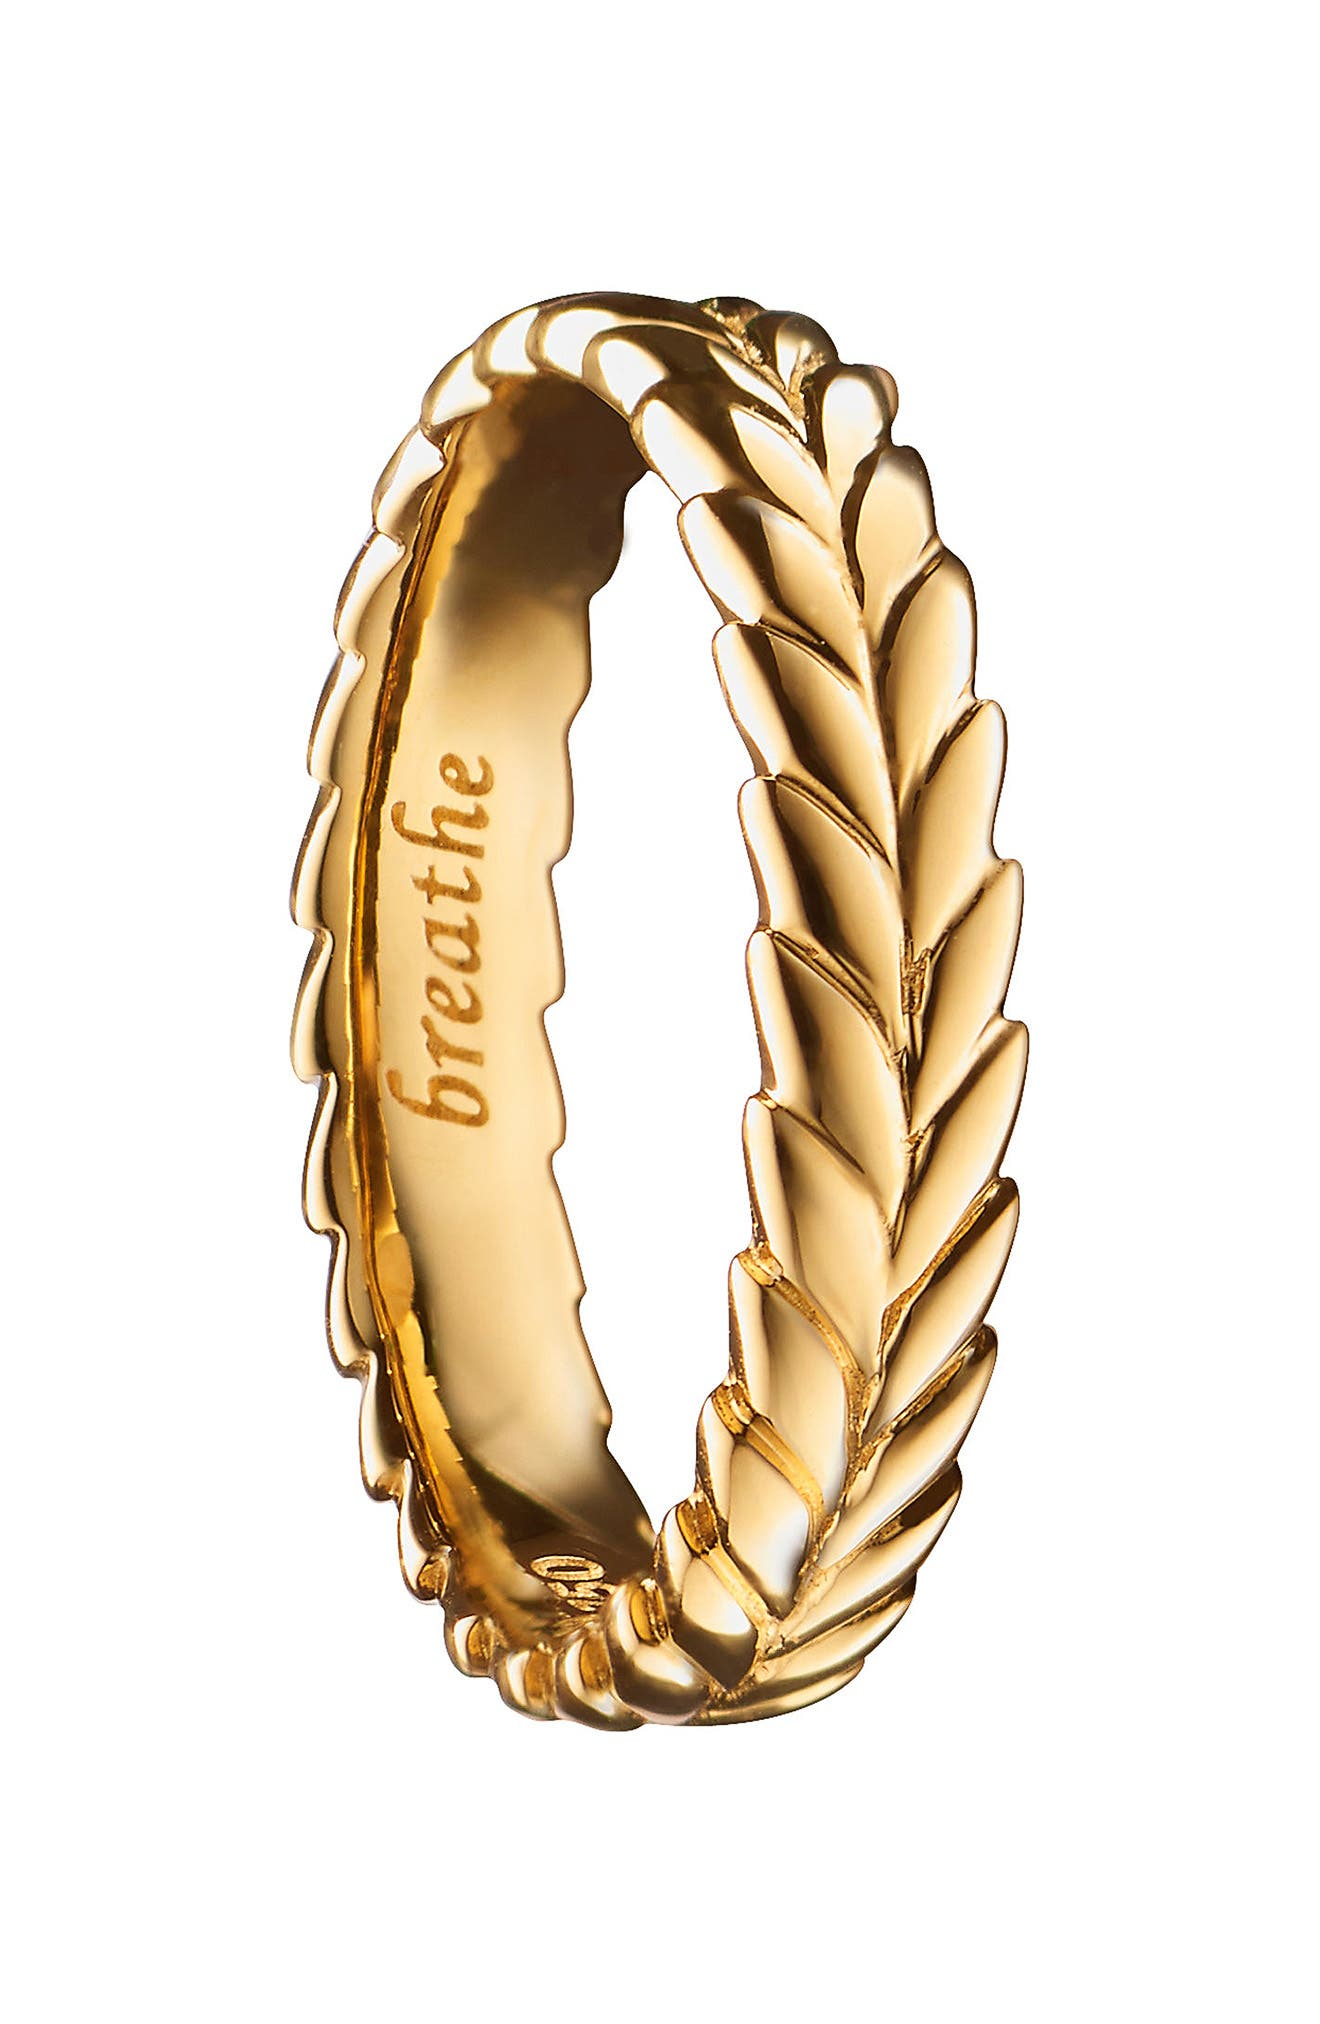 Breathe 18K Gold Poesy Ring Charm,                             Main thumbnail 1, color,                             18K Yellow Gold